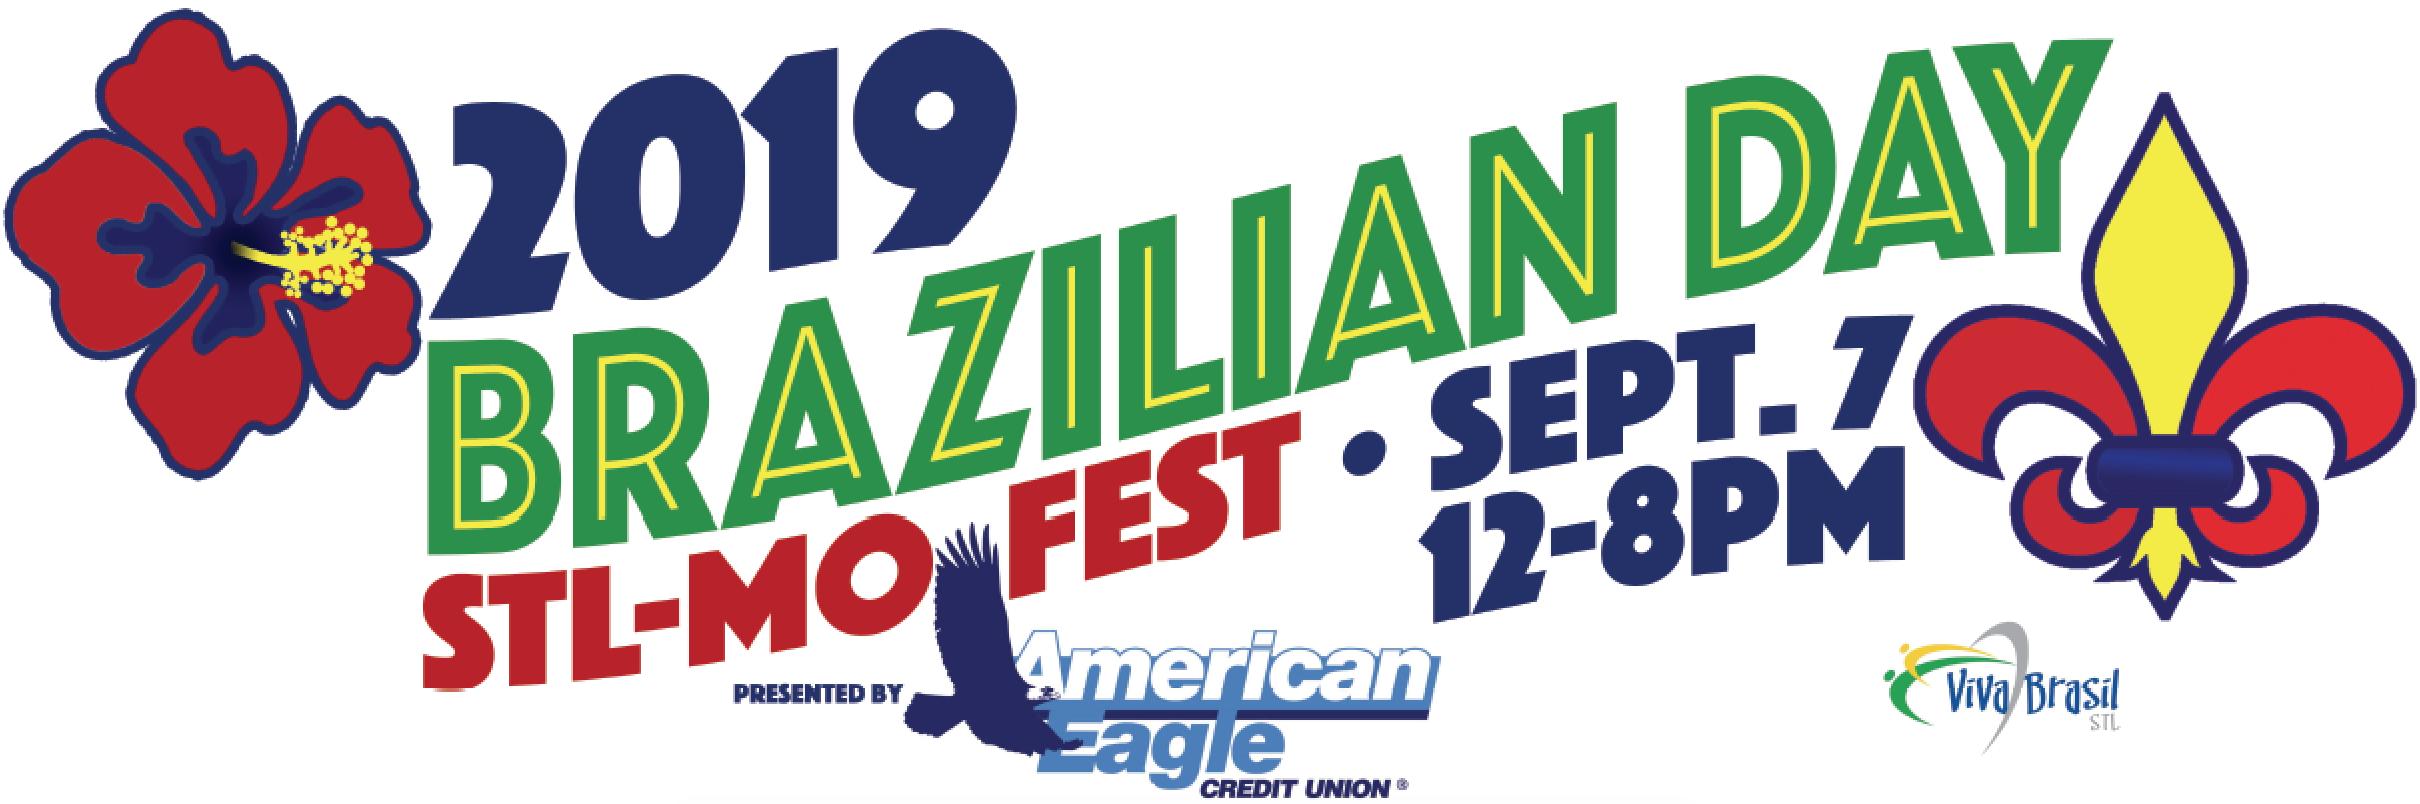 Brazilian day STL MO Fest.png